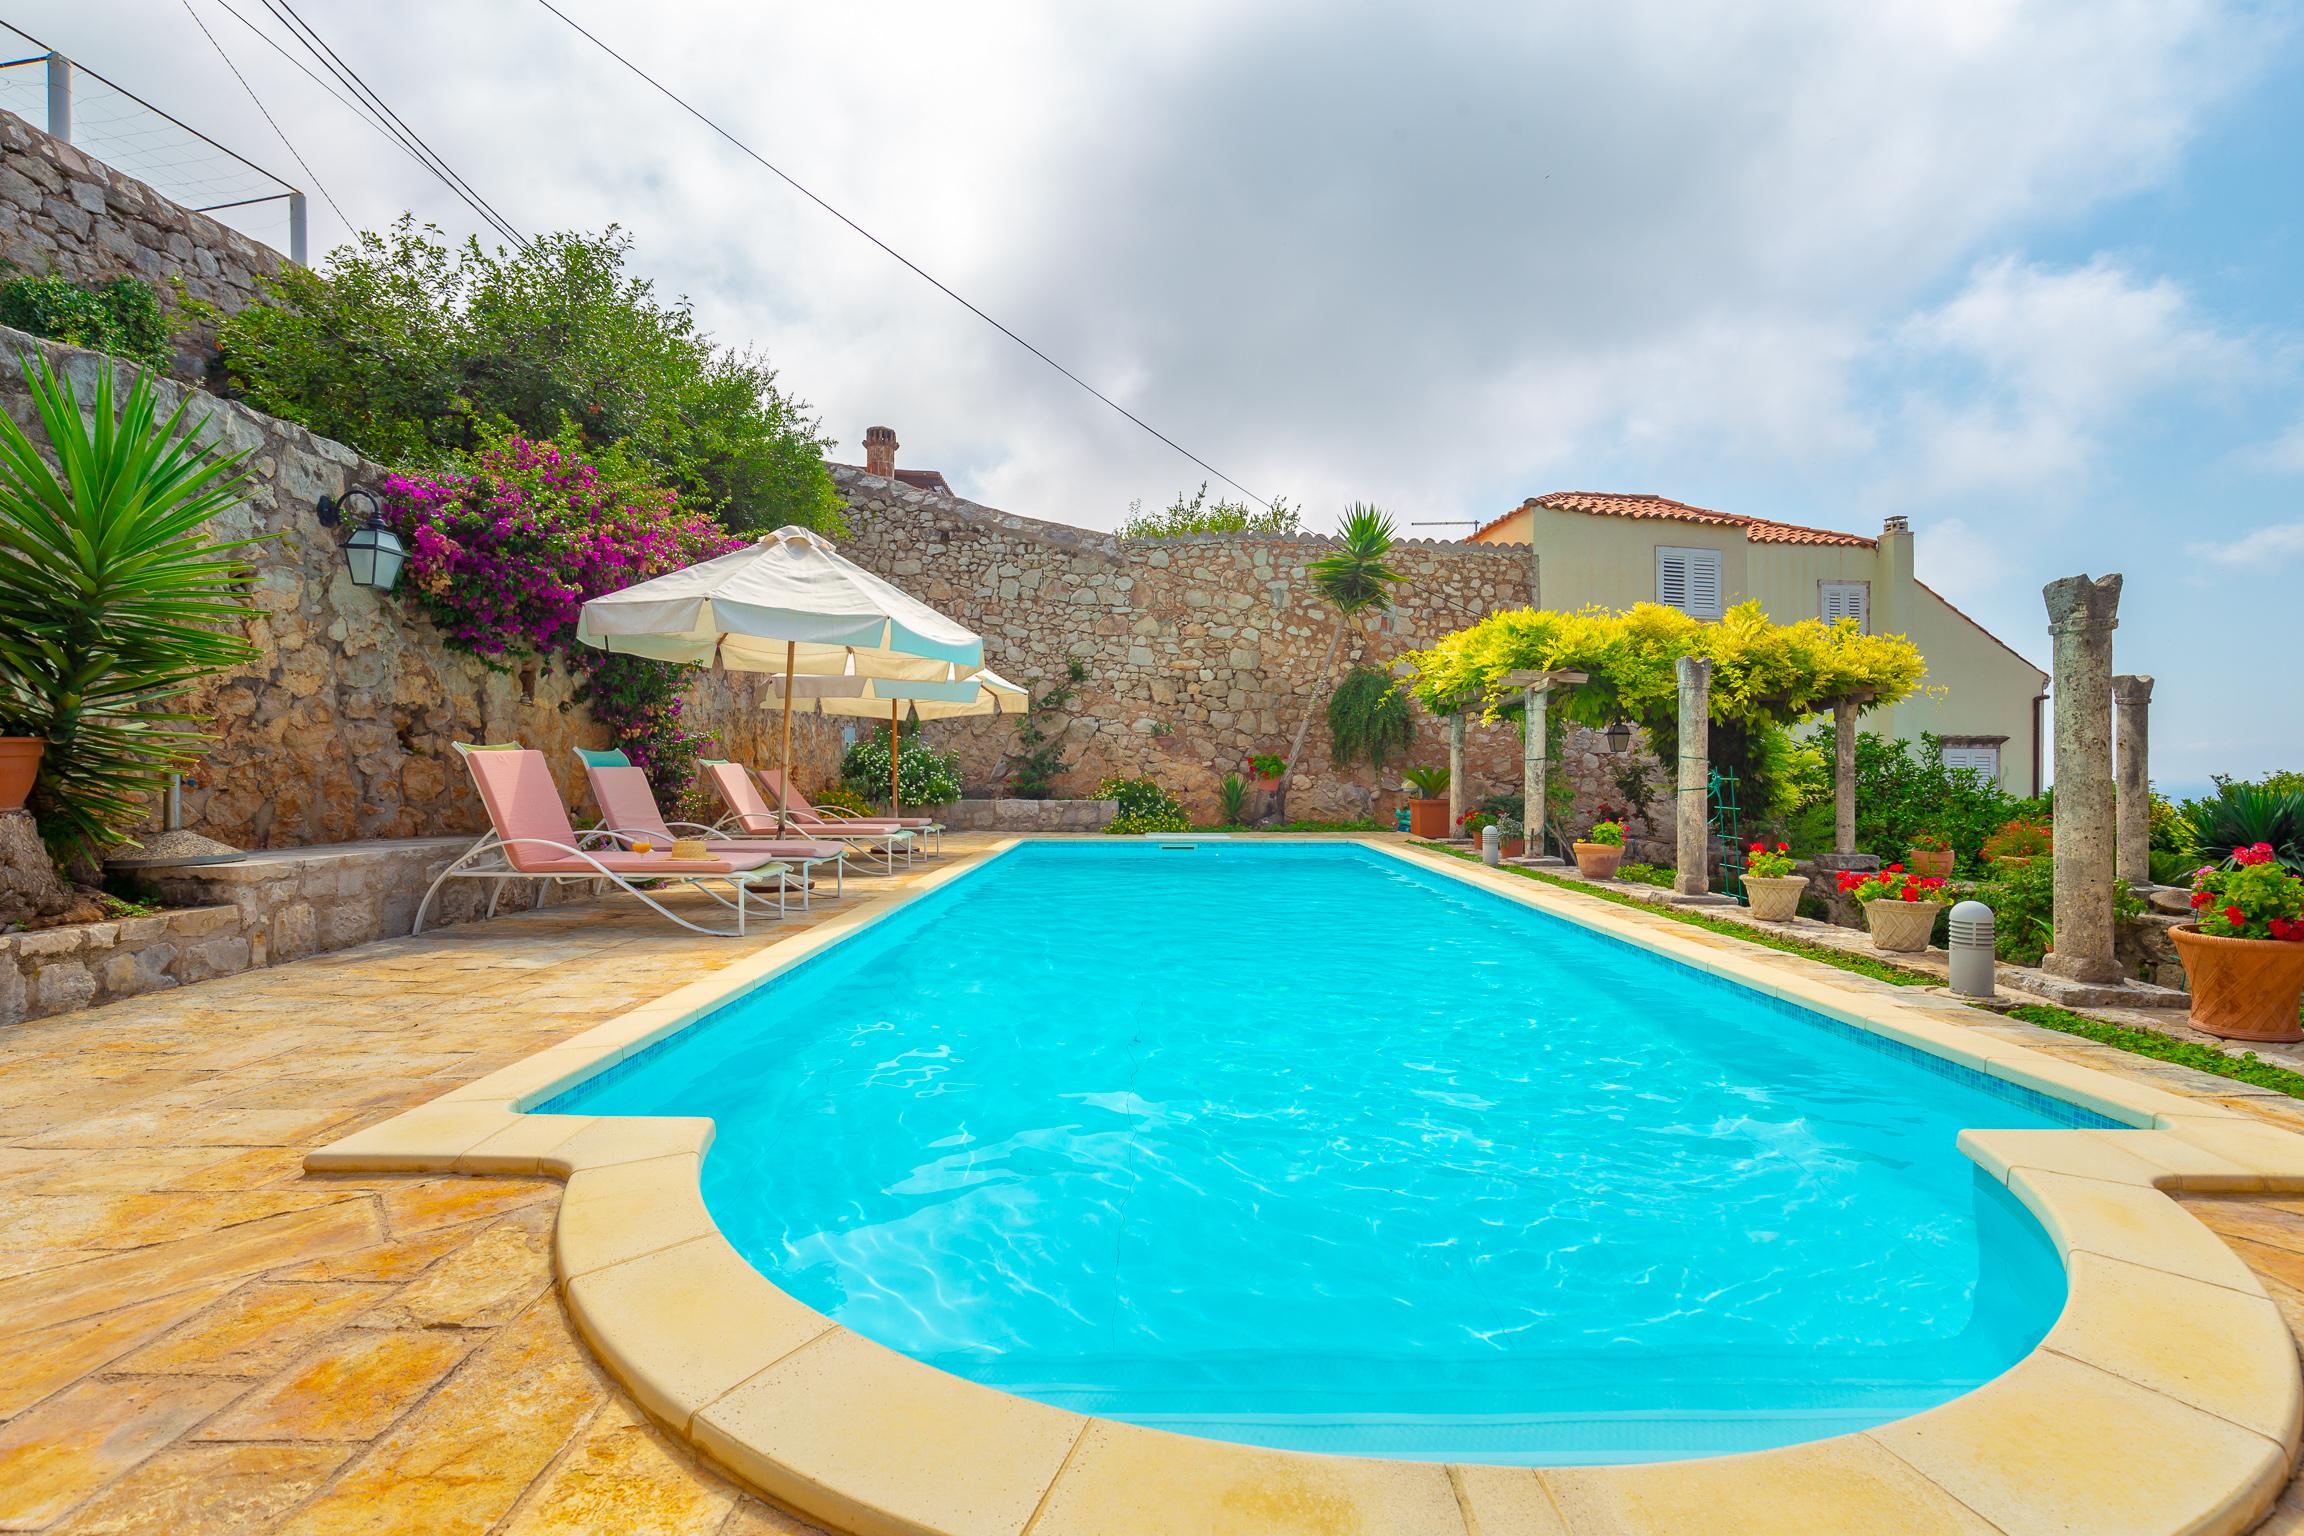 Apartments Allure Gardens Apartment 50089, Dubrovnik, Dubrovnik, Dubrovnik Region